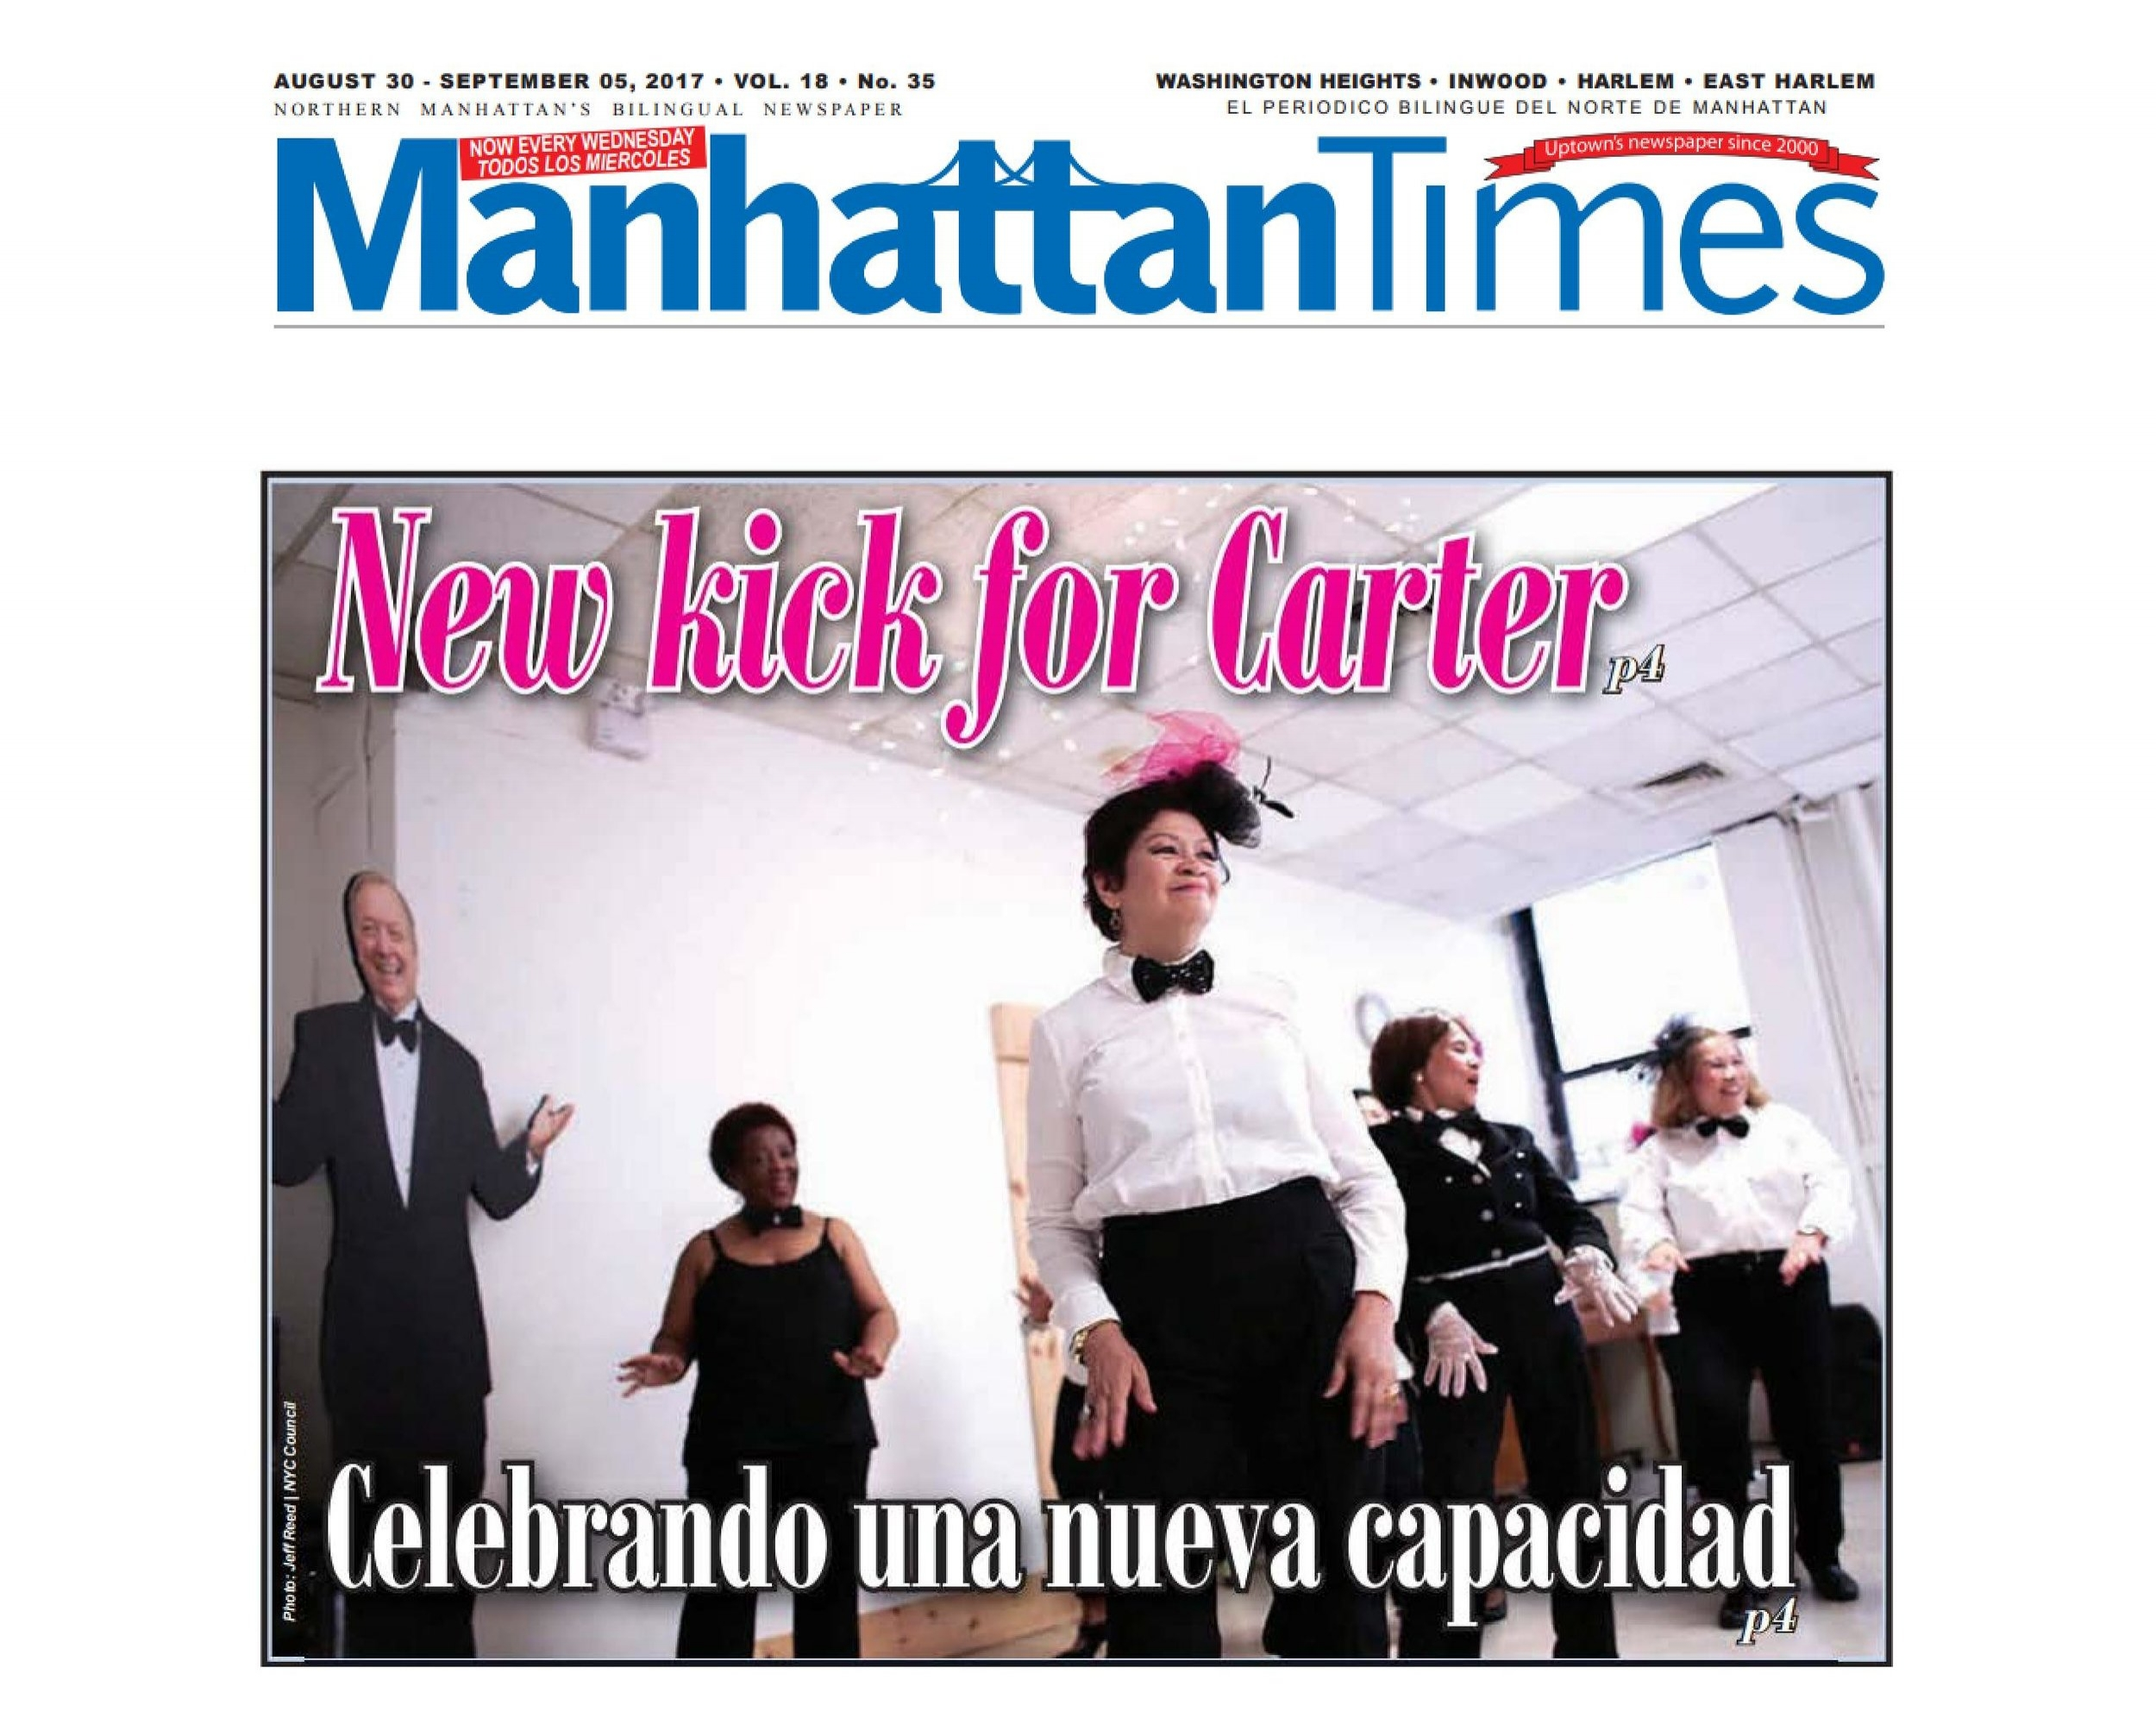 Manhattan Times 8.30.17-9.5.17 (Covello Rennovations Mark-Viverito)-page-001.jpg